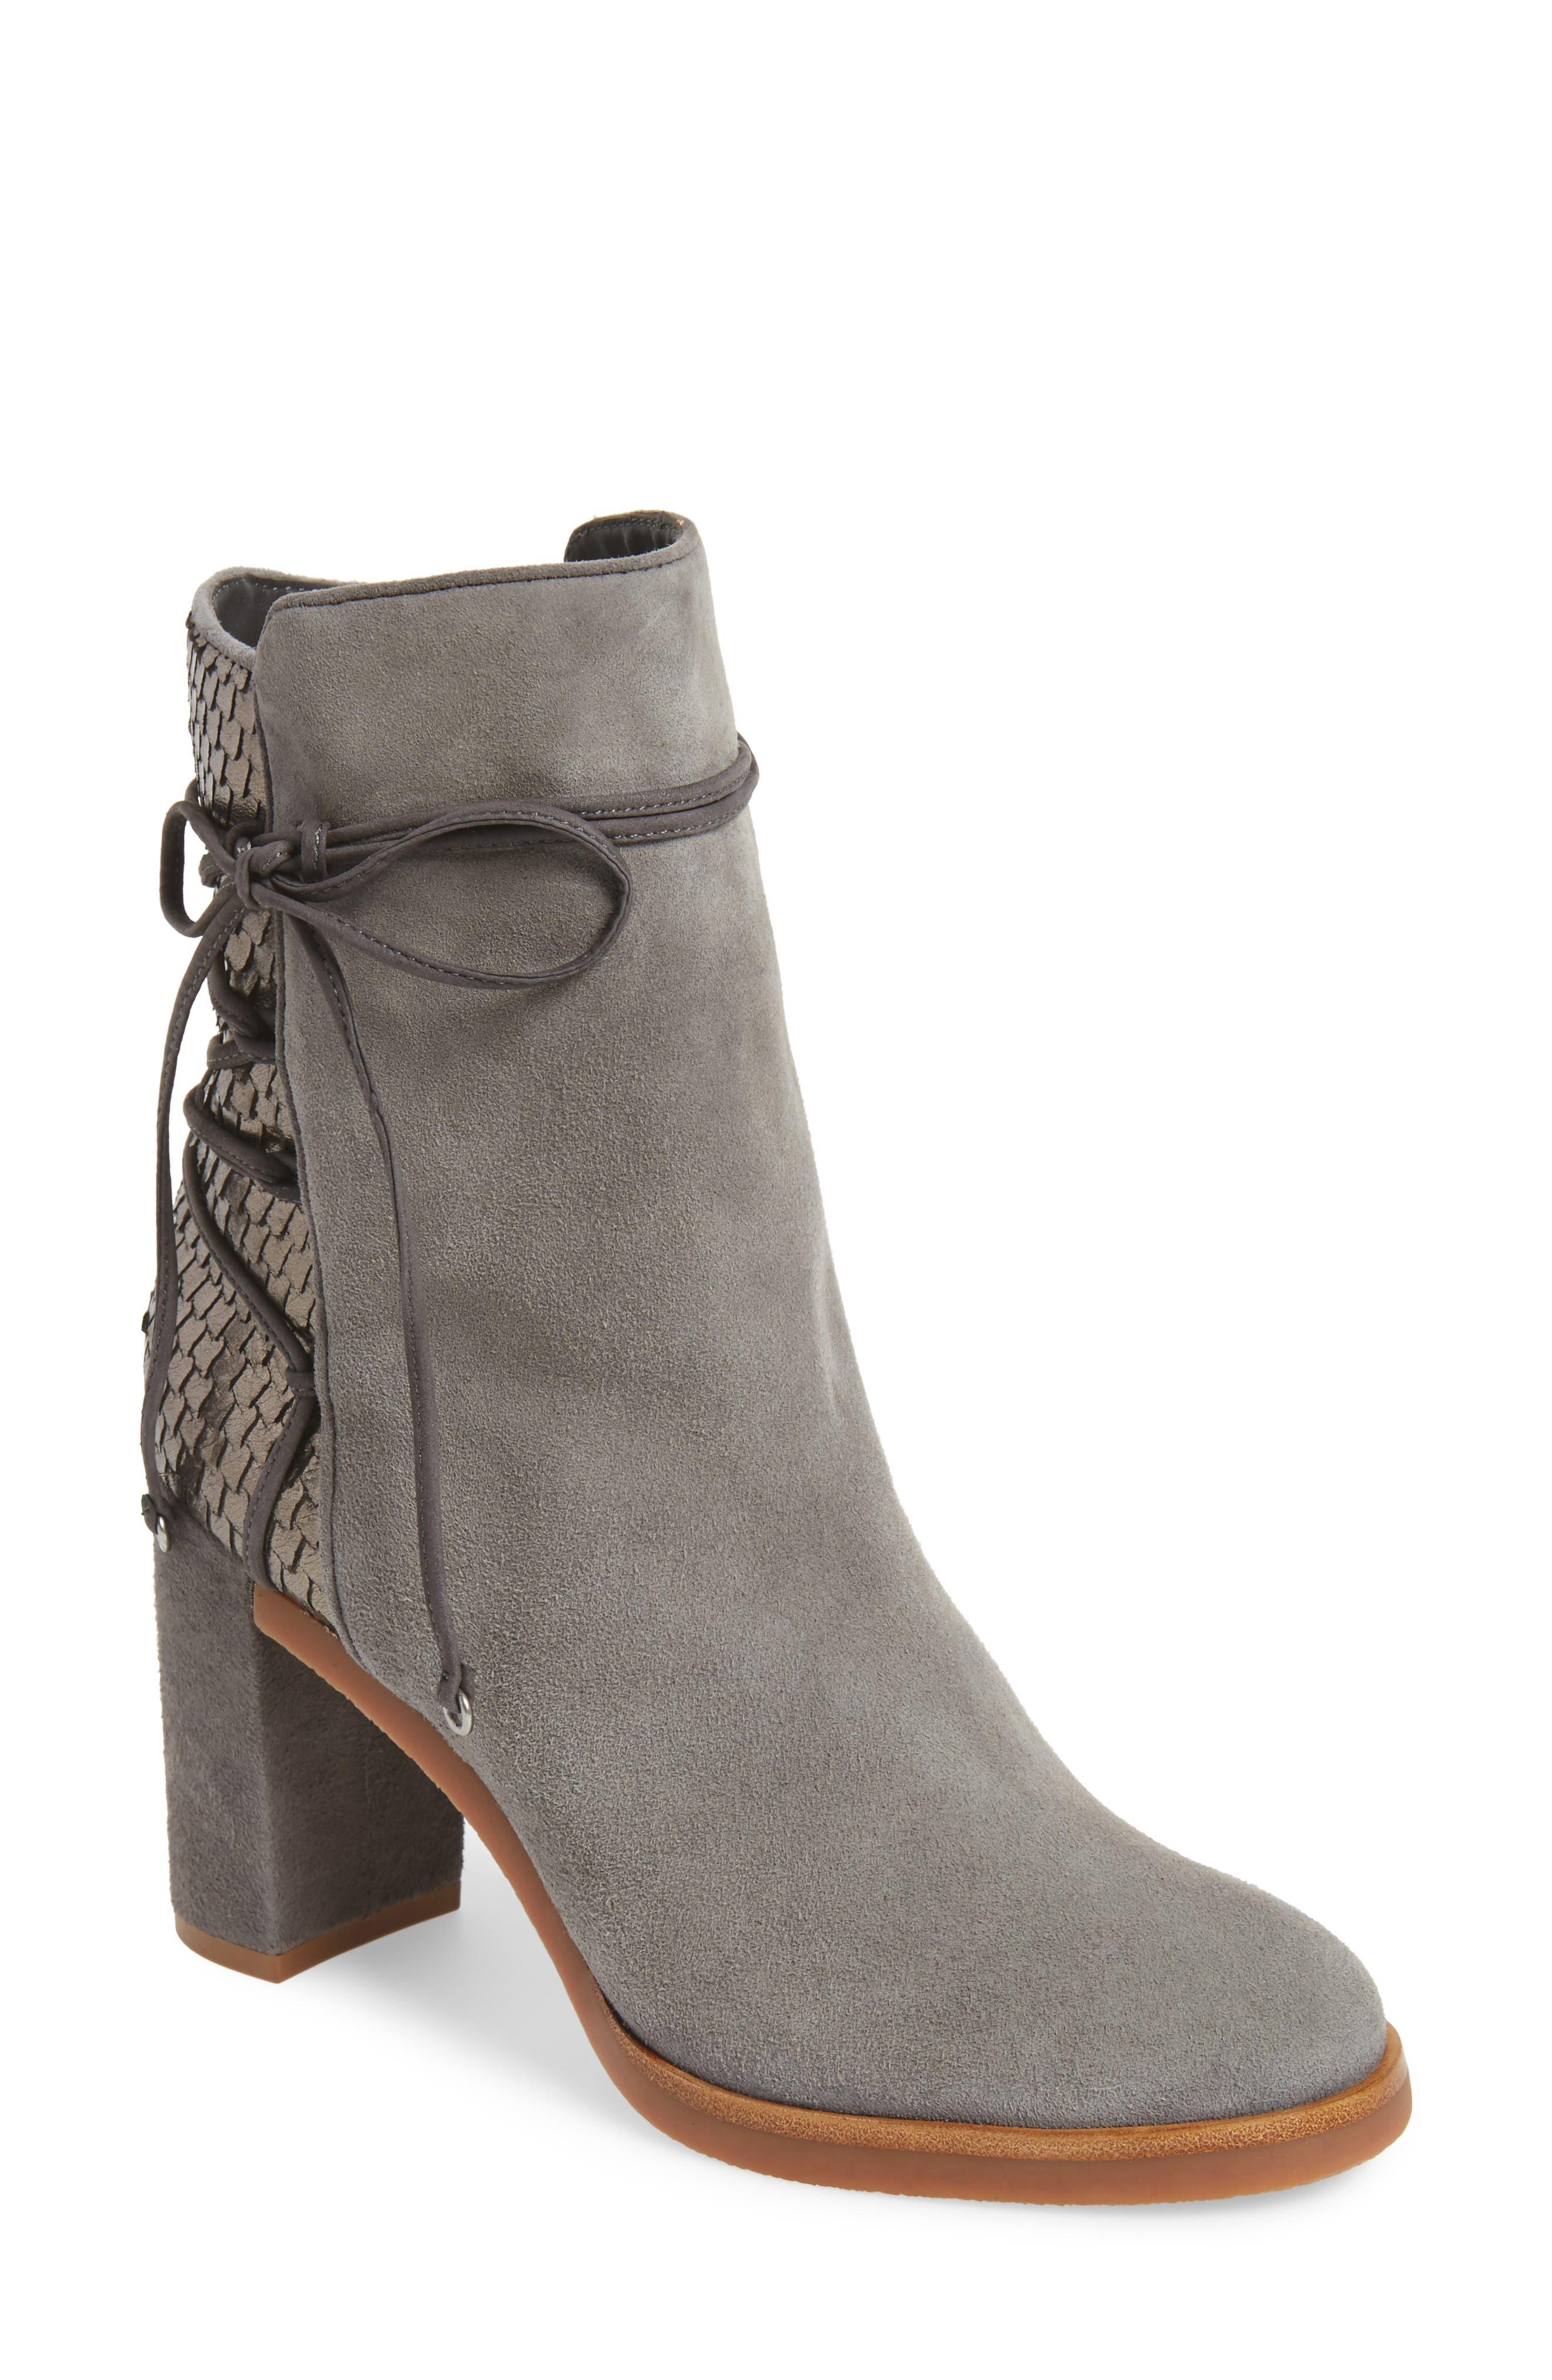 Main Image - Johnston & Murphy Adley Ankle Wrap Boot (Women)